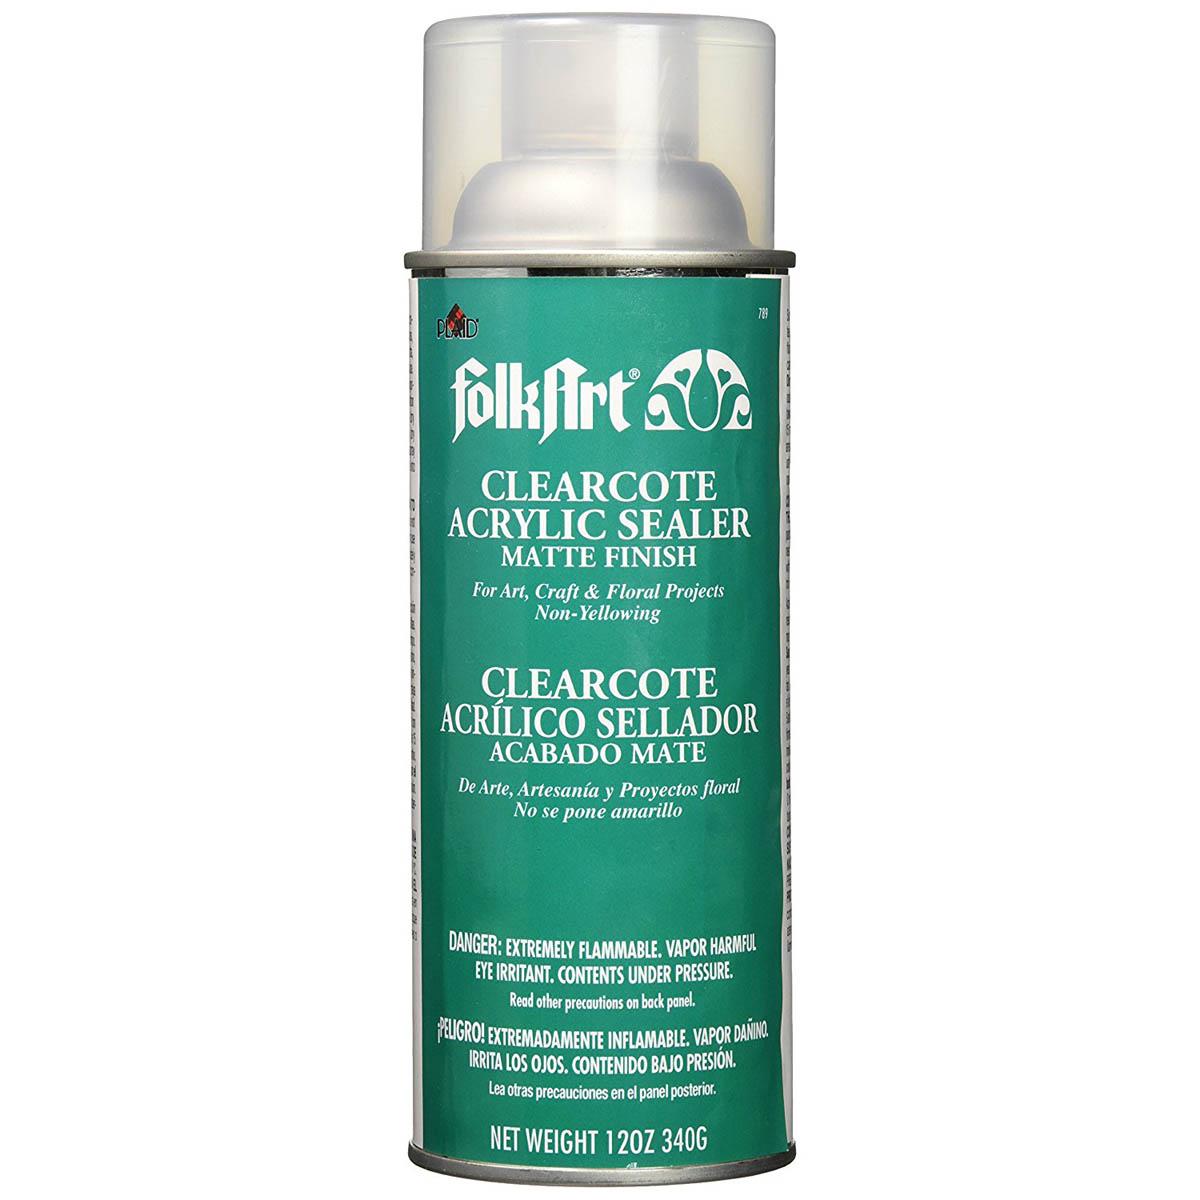 FolkArt ® Finishes - Clearcote™ Aerosol Acrylic Sealer - Matte, 11 oz.